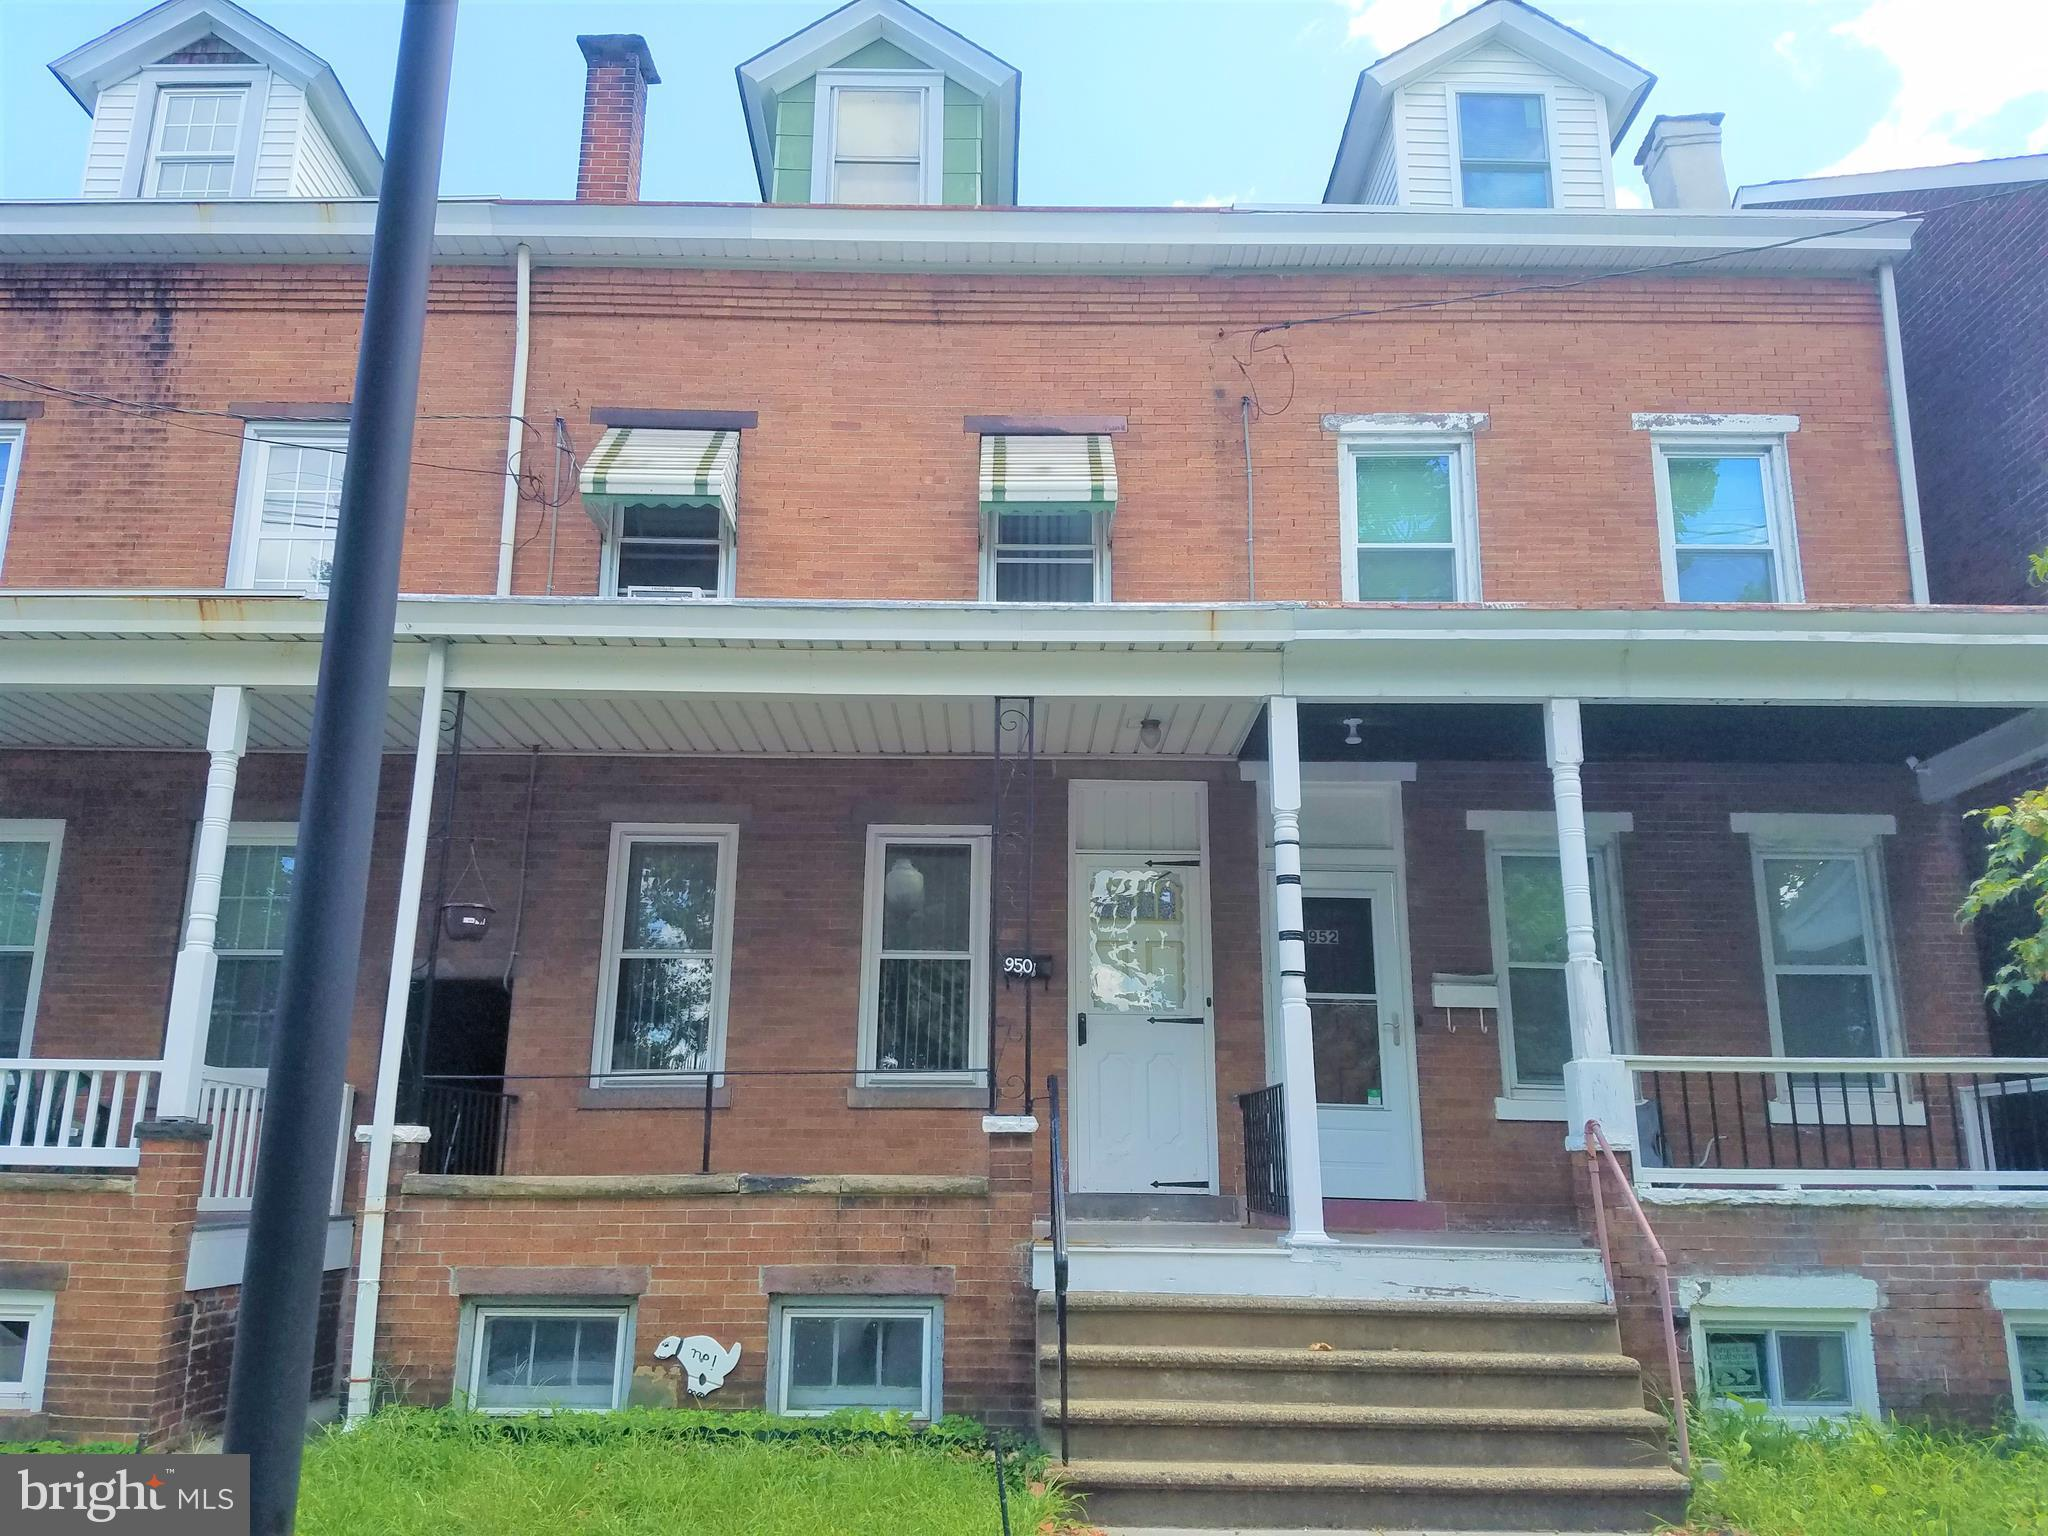 950 LAMBERTON STREET, TRENTON, NJ 08611